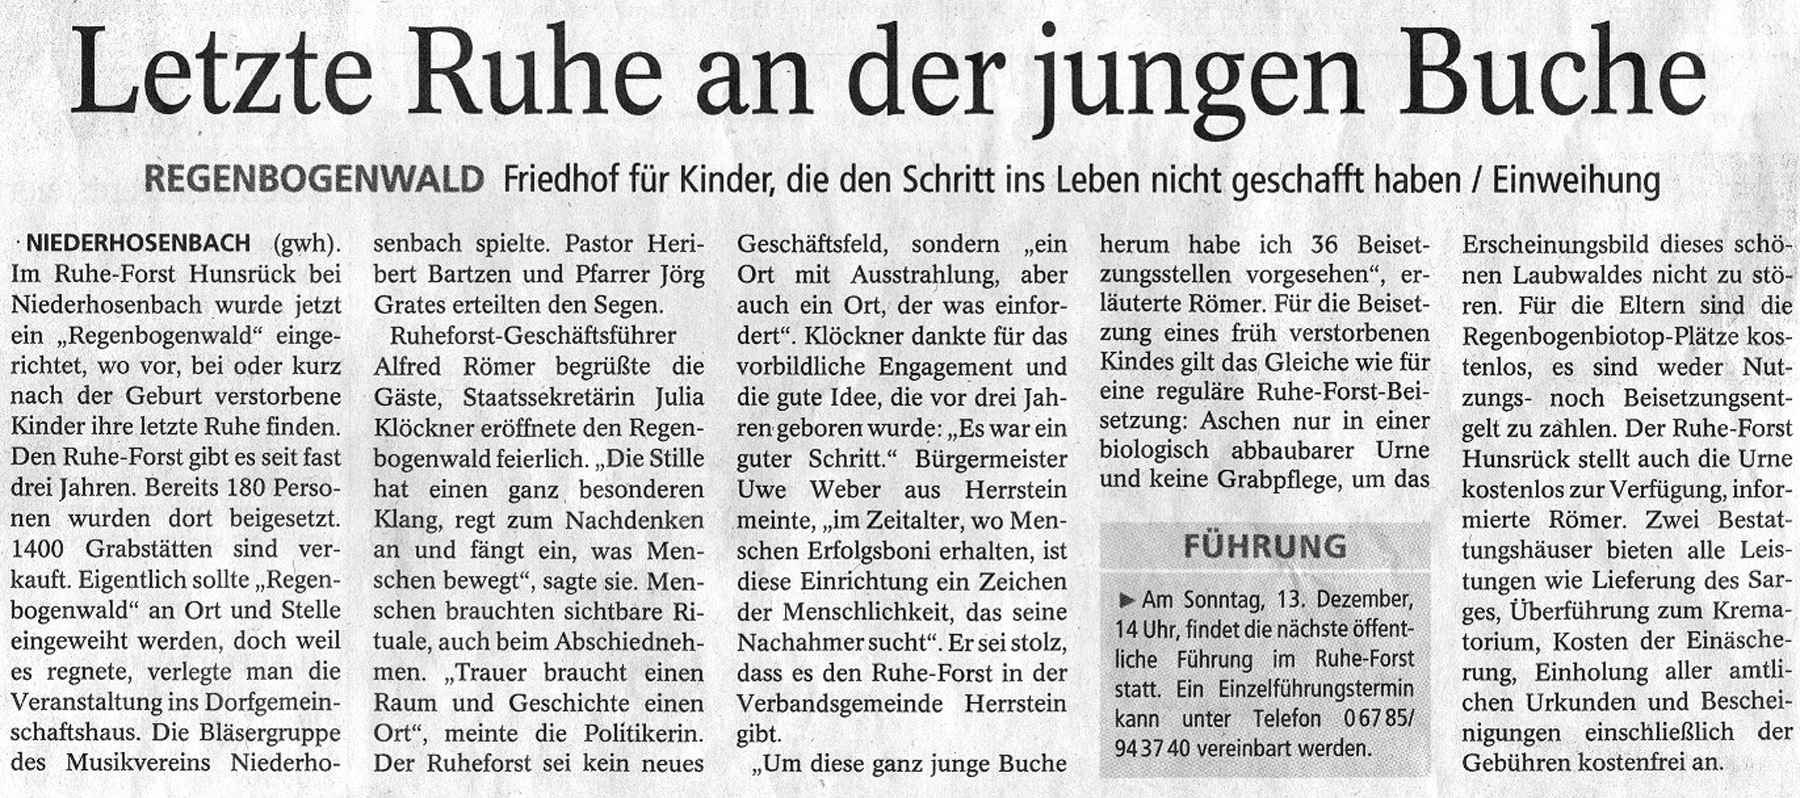 2009.12.02. Rhein-Main-Presse - Kopie